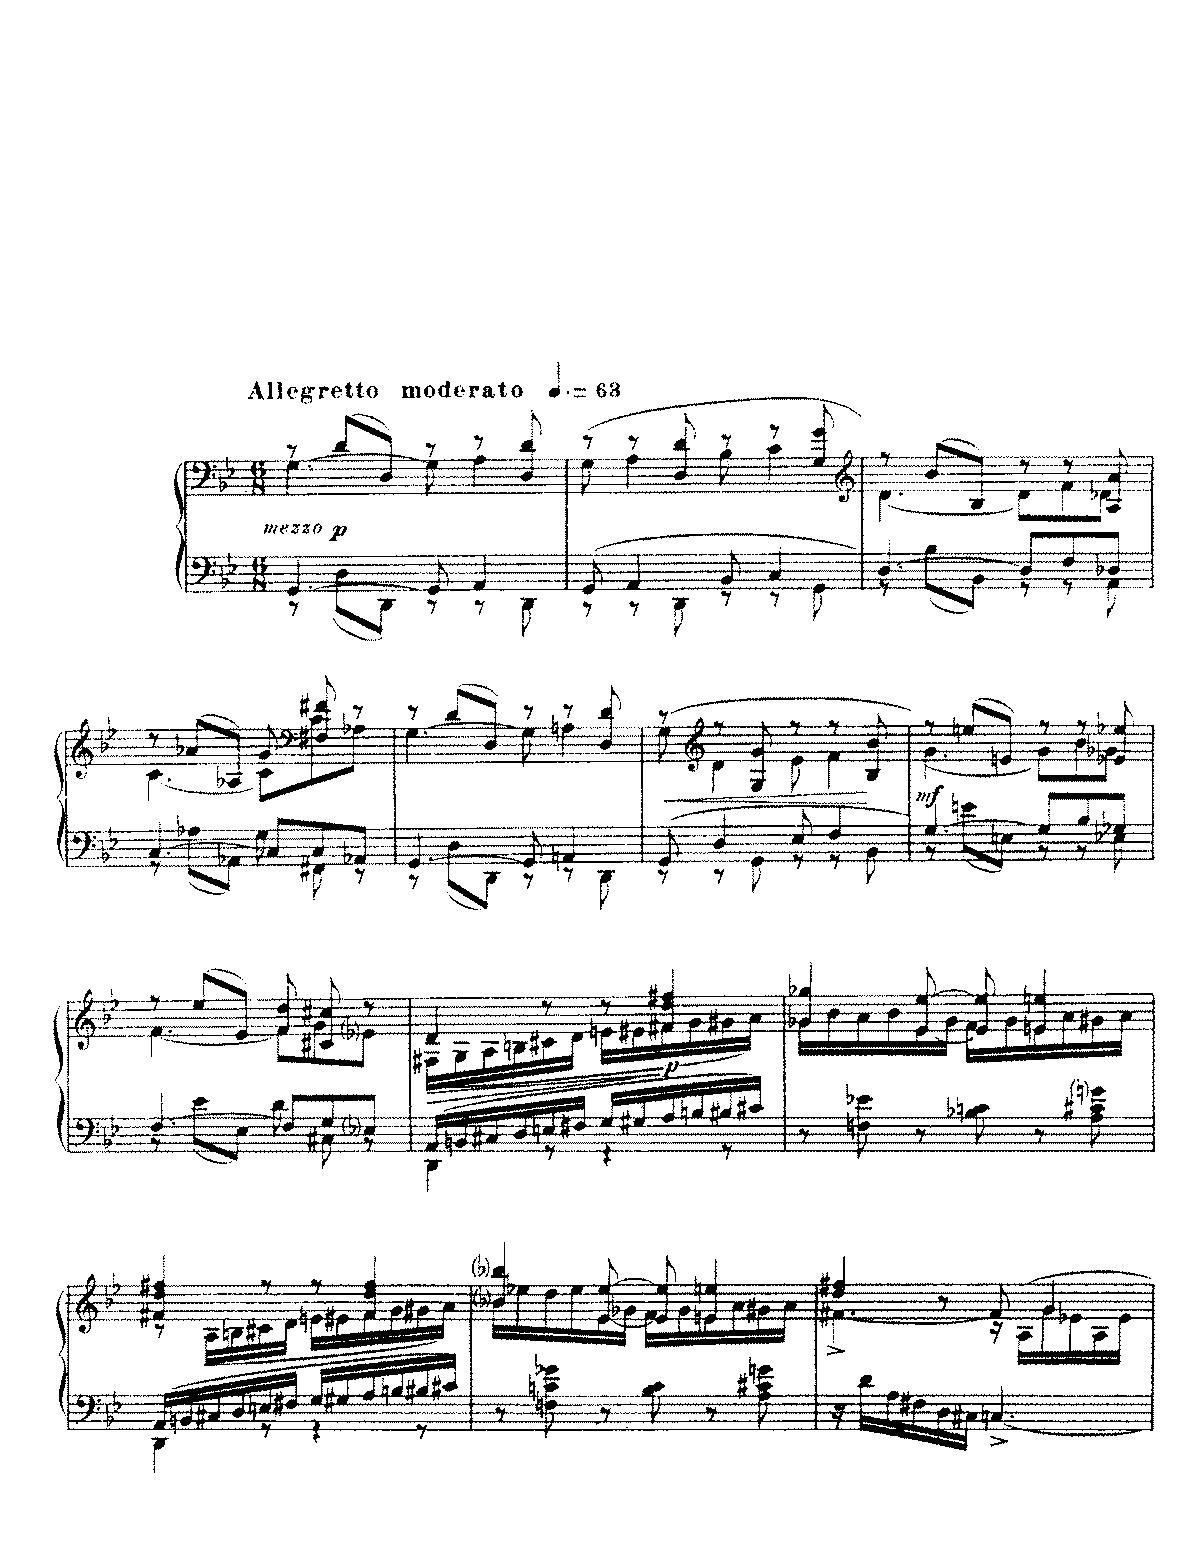 Barcarolle No. 1 in A Minor, Op. 26